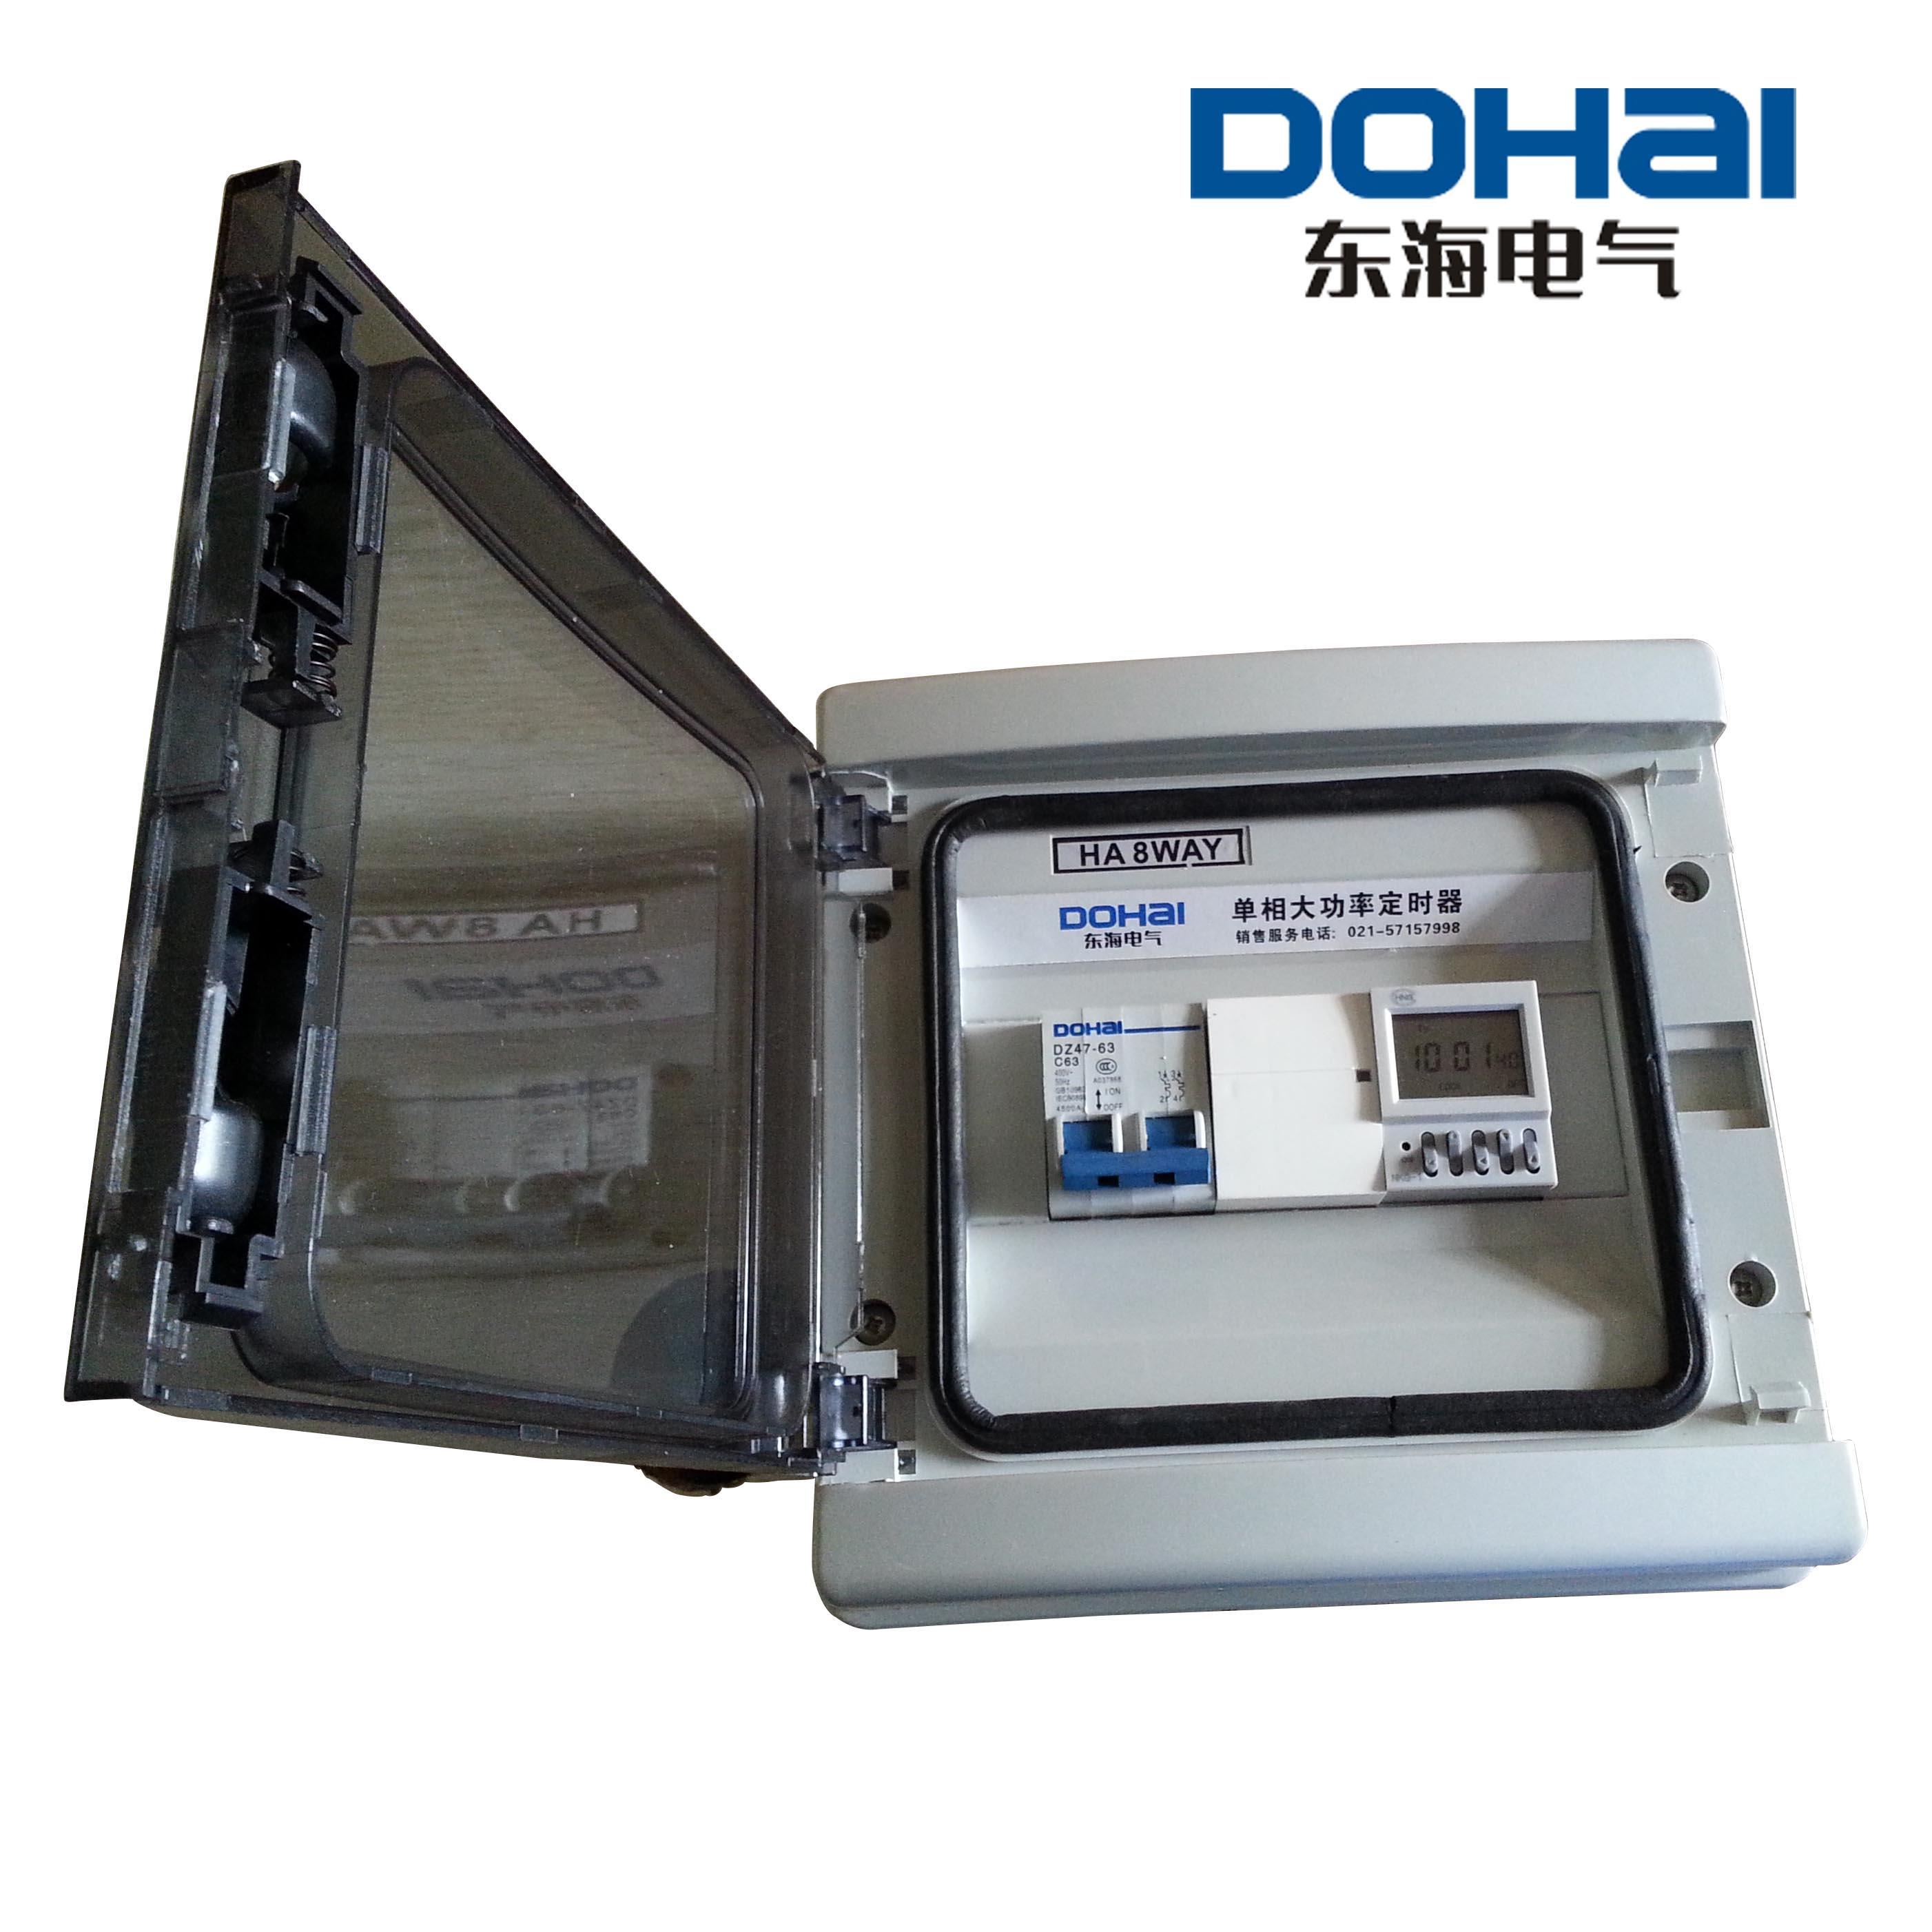 Die post Mikro - computer gesteuerten schalter Street - Werbung Lampe timer 220V16 - Gruppe e - Zeit - 32a